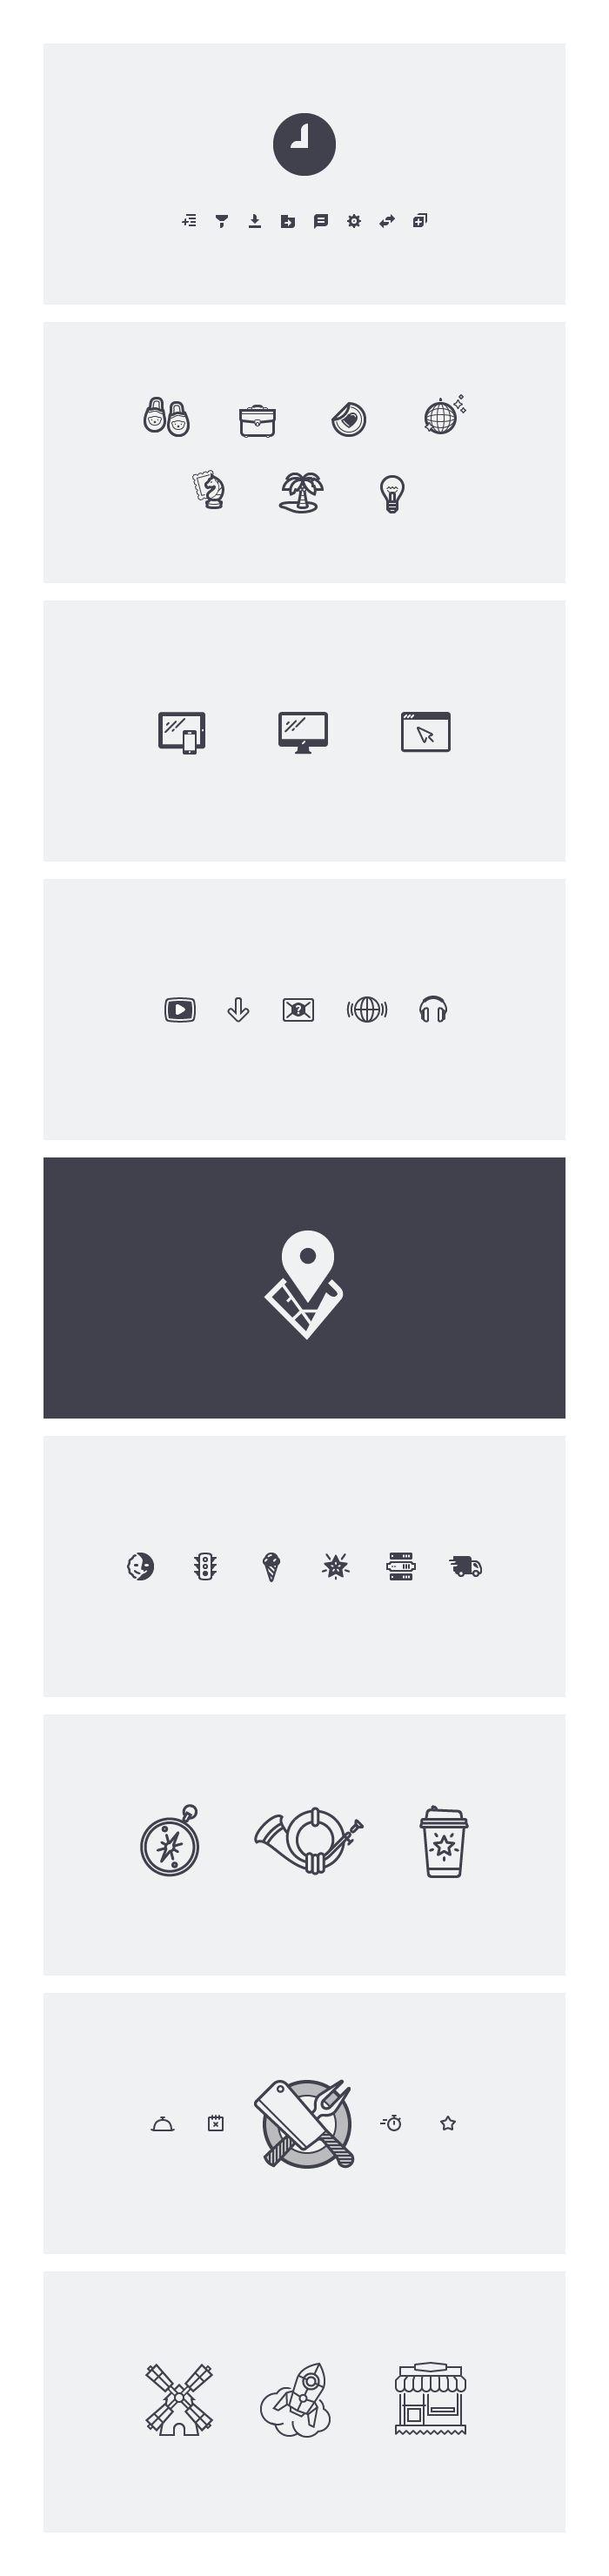 Иконки, Пиктограмма © ЕвгенийАрцебасов